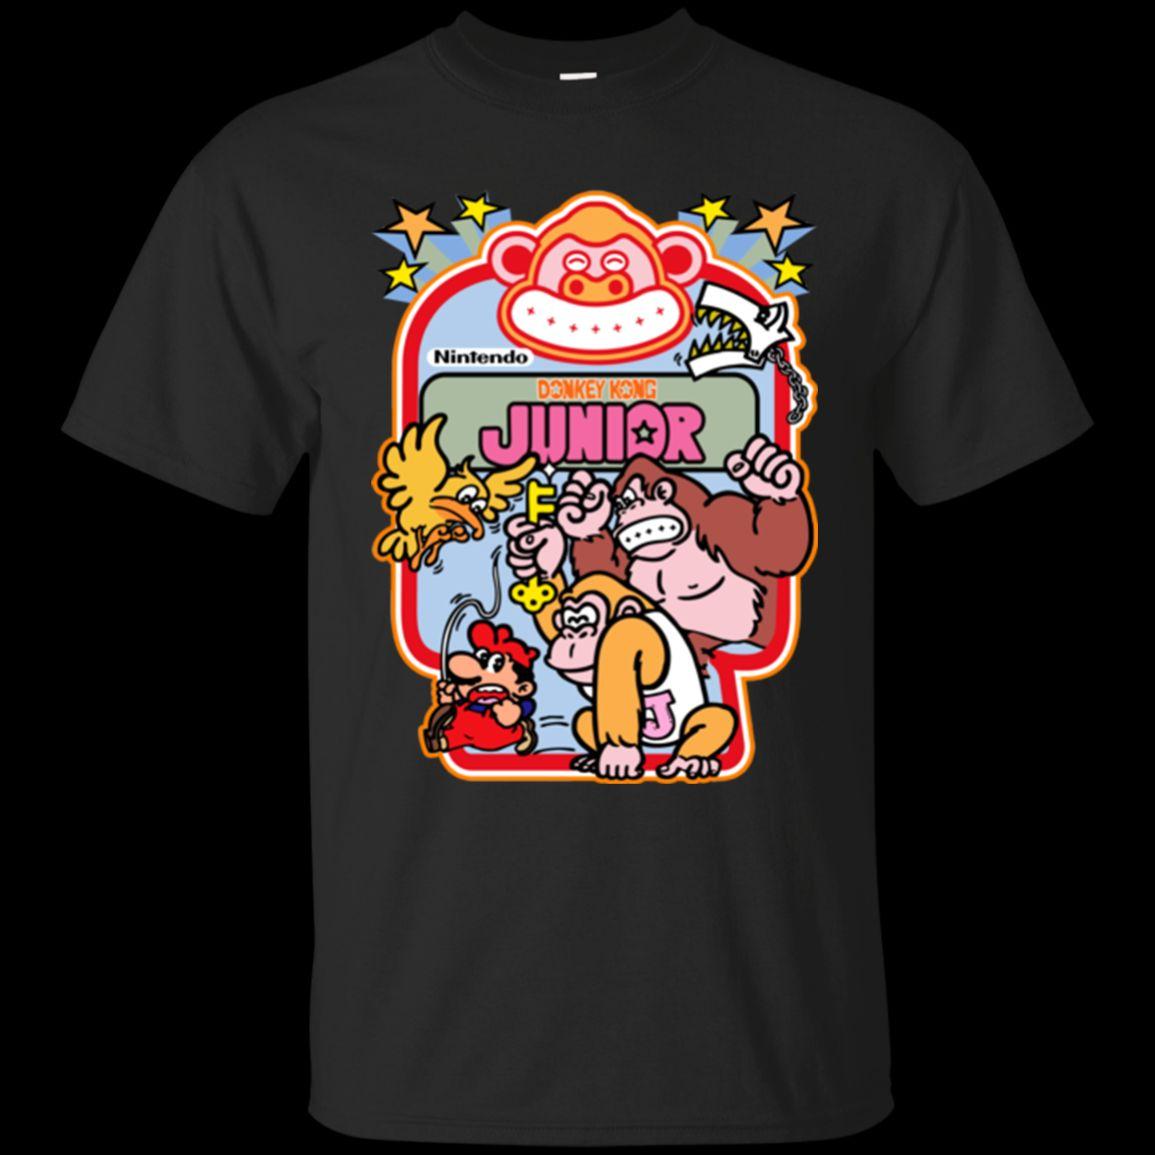 40066253 Donkey Kong Junior Arcade Cabinet Decal G200 Wholesale Discount T Shirt  Cartoon T Shirt Men Unisex New Fashion Tshirt Top Funky T Shirt Designs T  Shirt ...